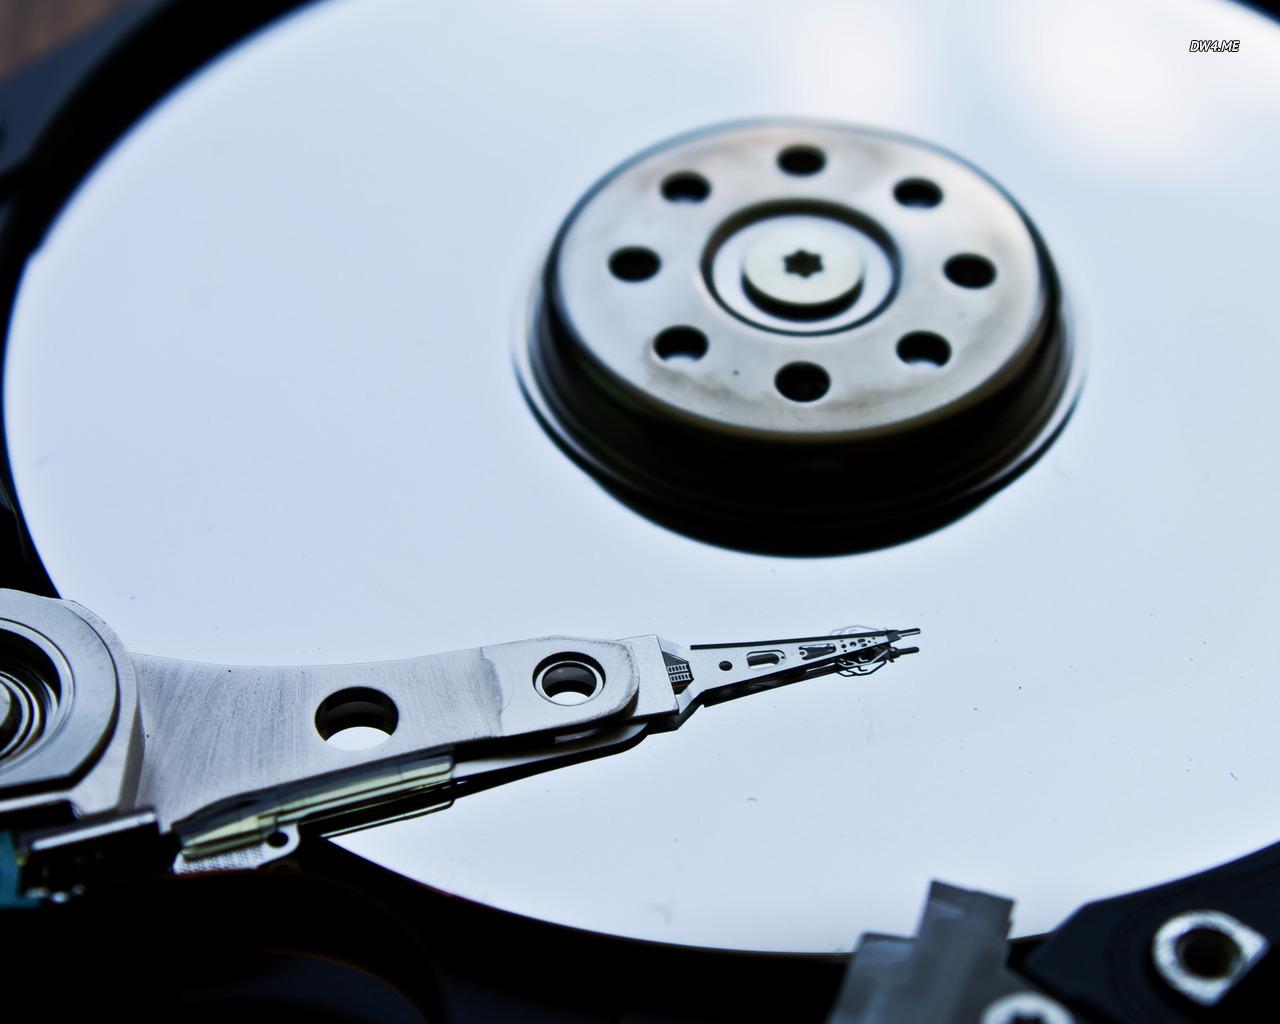 Hard disk drive wallpaper   Computer wallpapers   760 1280x1024